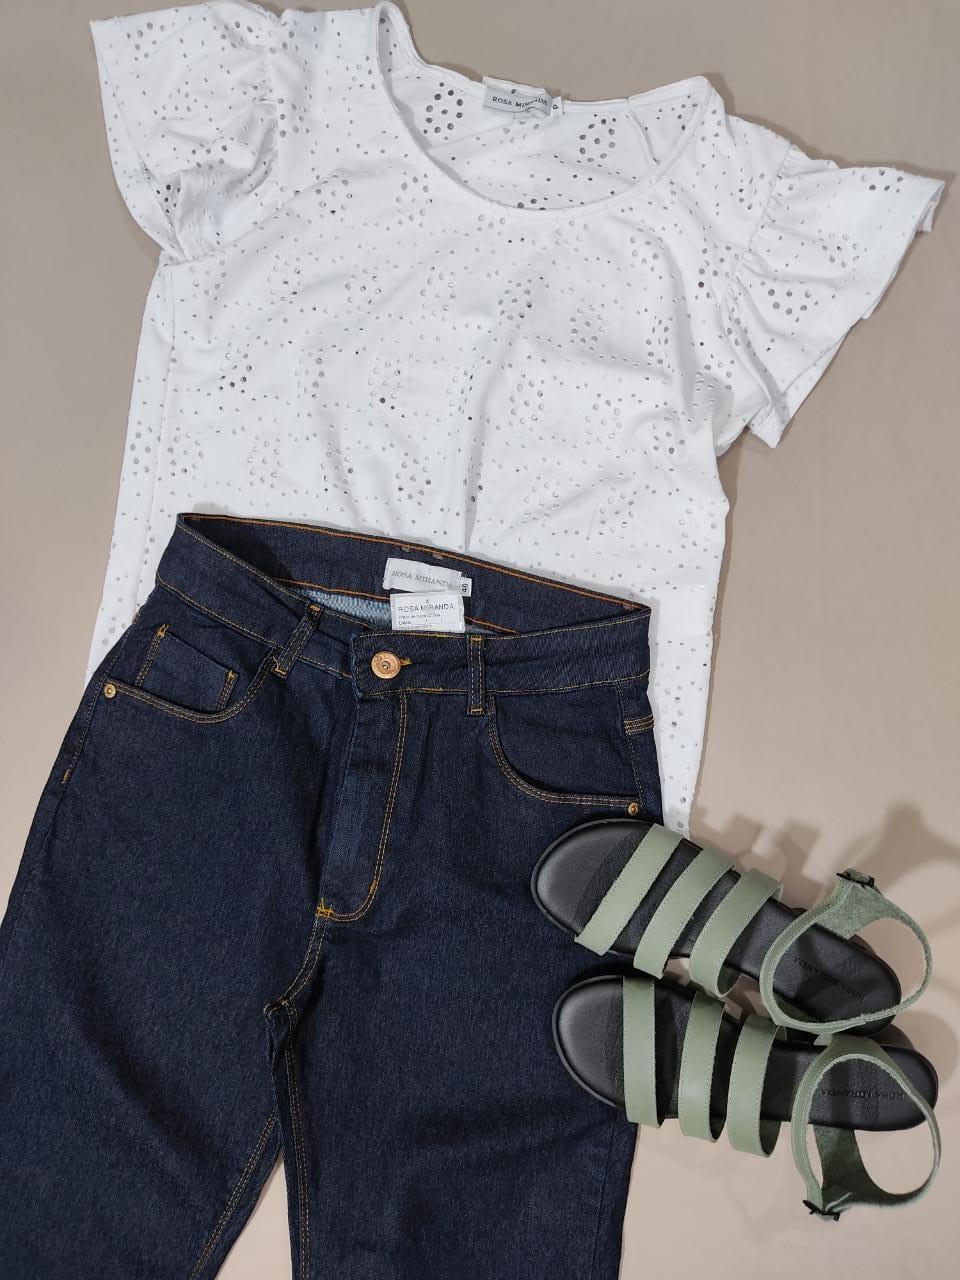 Calça jeans Vieste